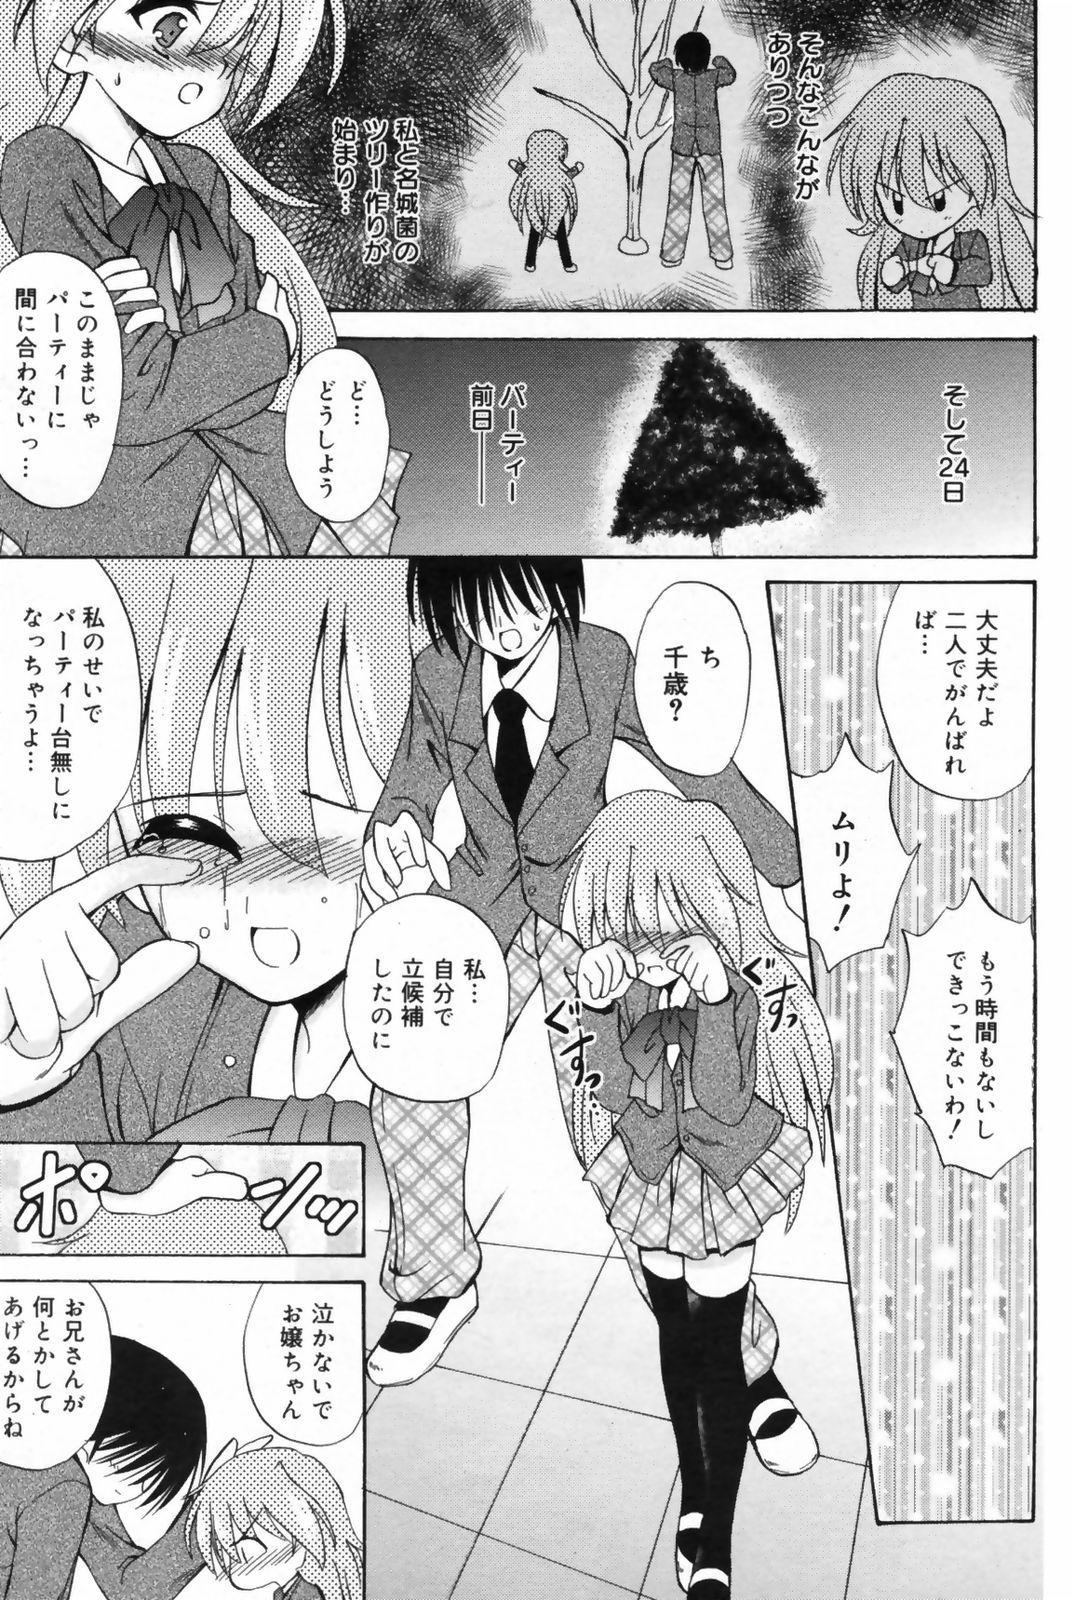 Manga Bangaichi 2009-02 Vol. 234 162